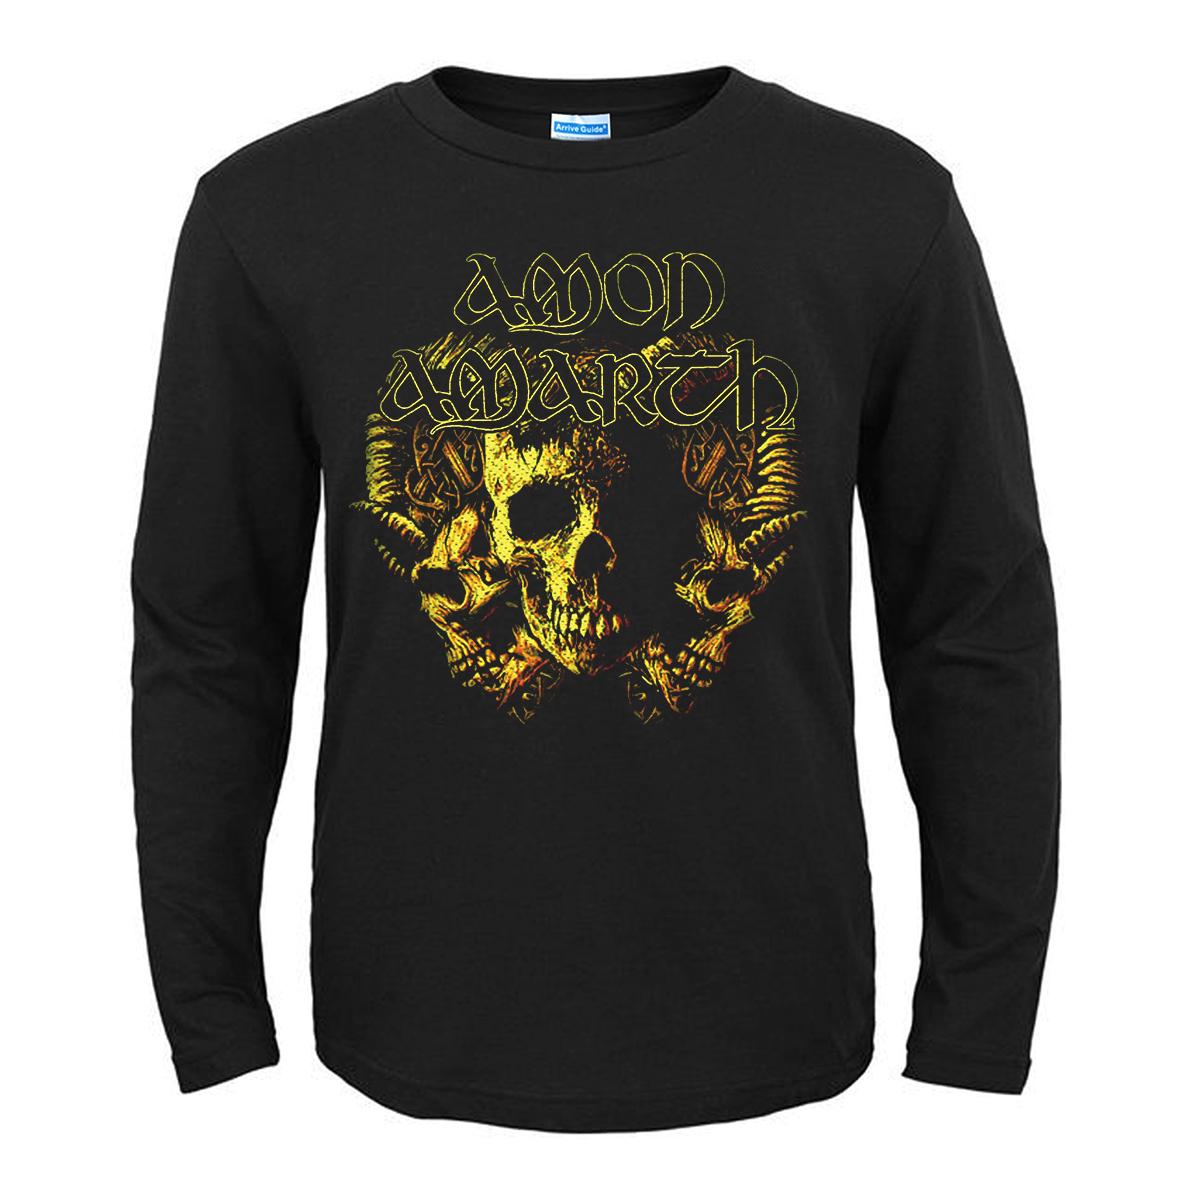 Merch T-Shirt Amon Amarth The Avenger Black